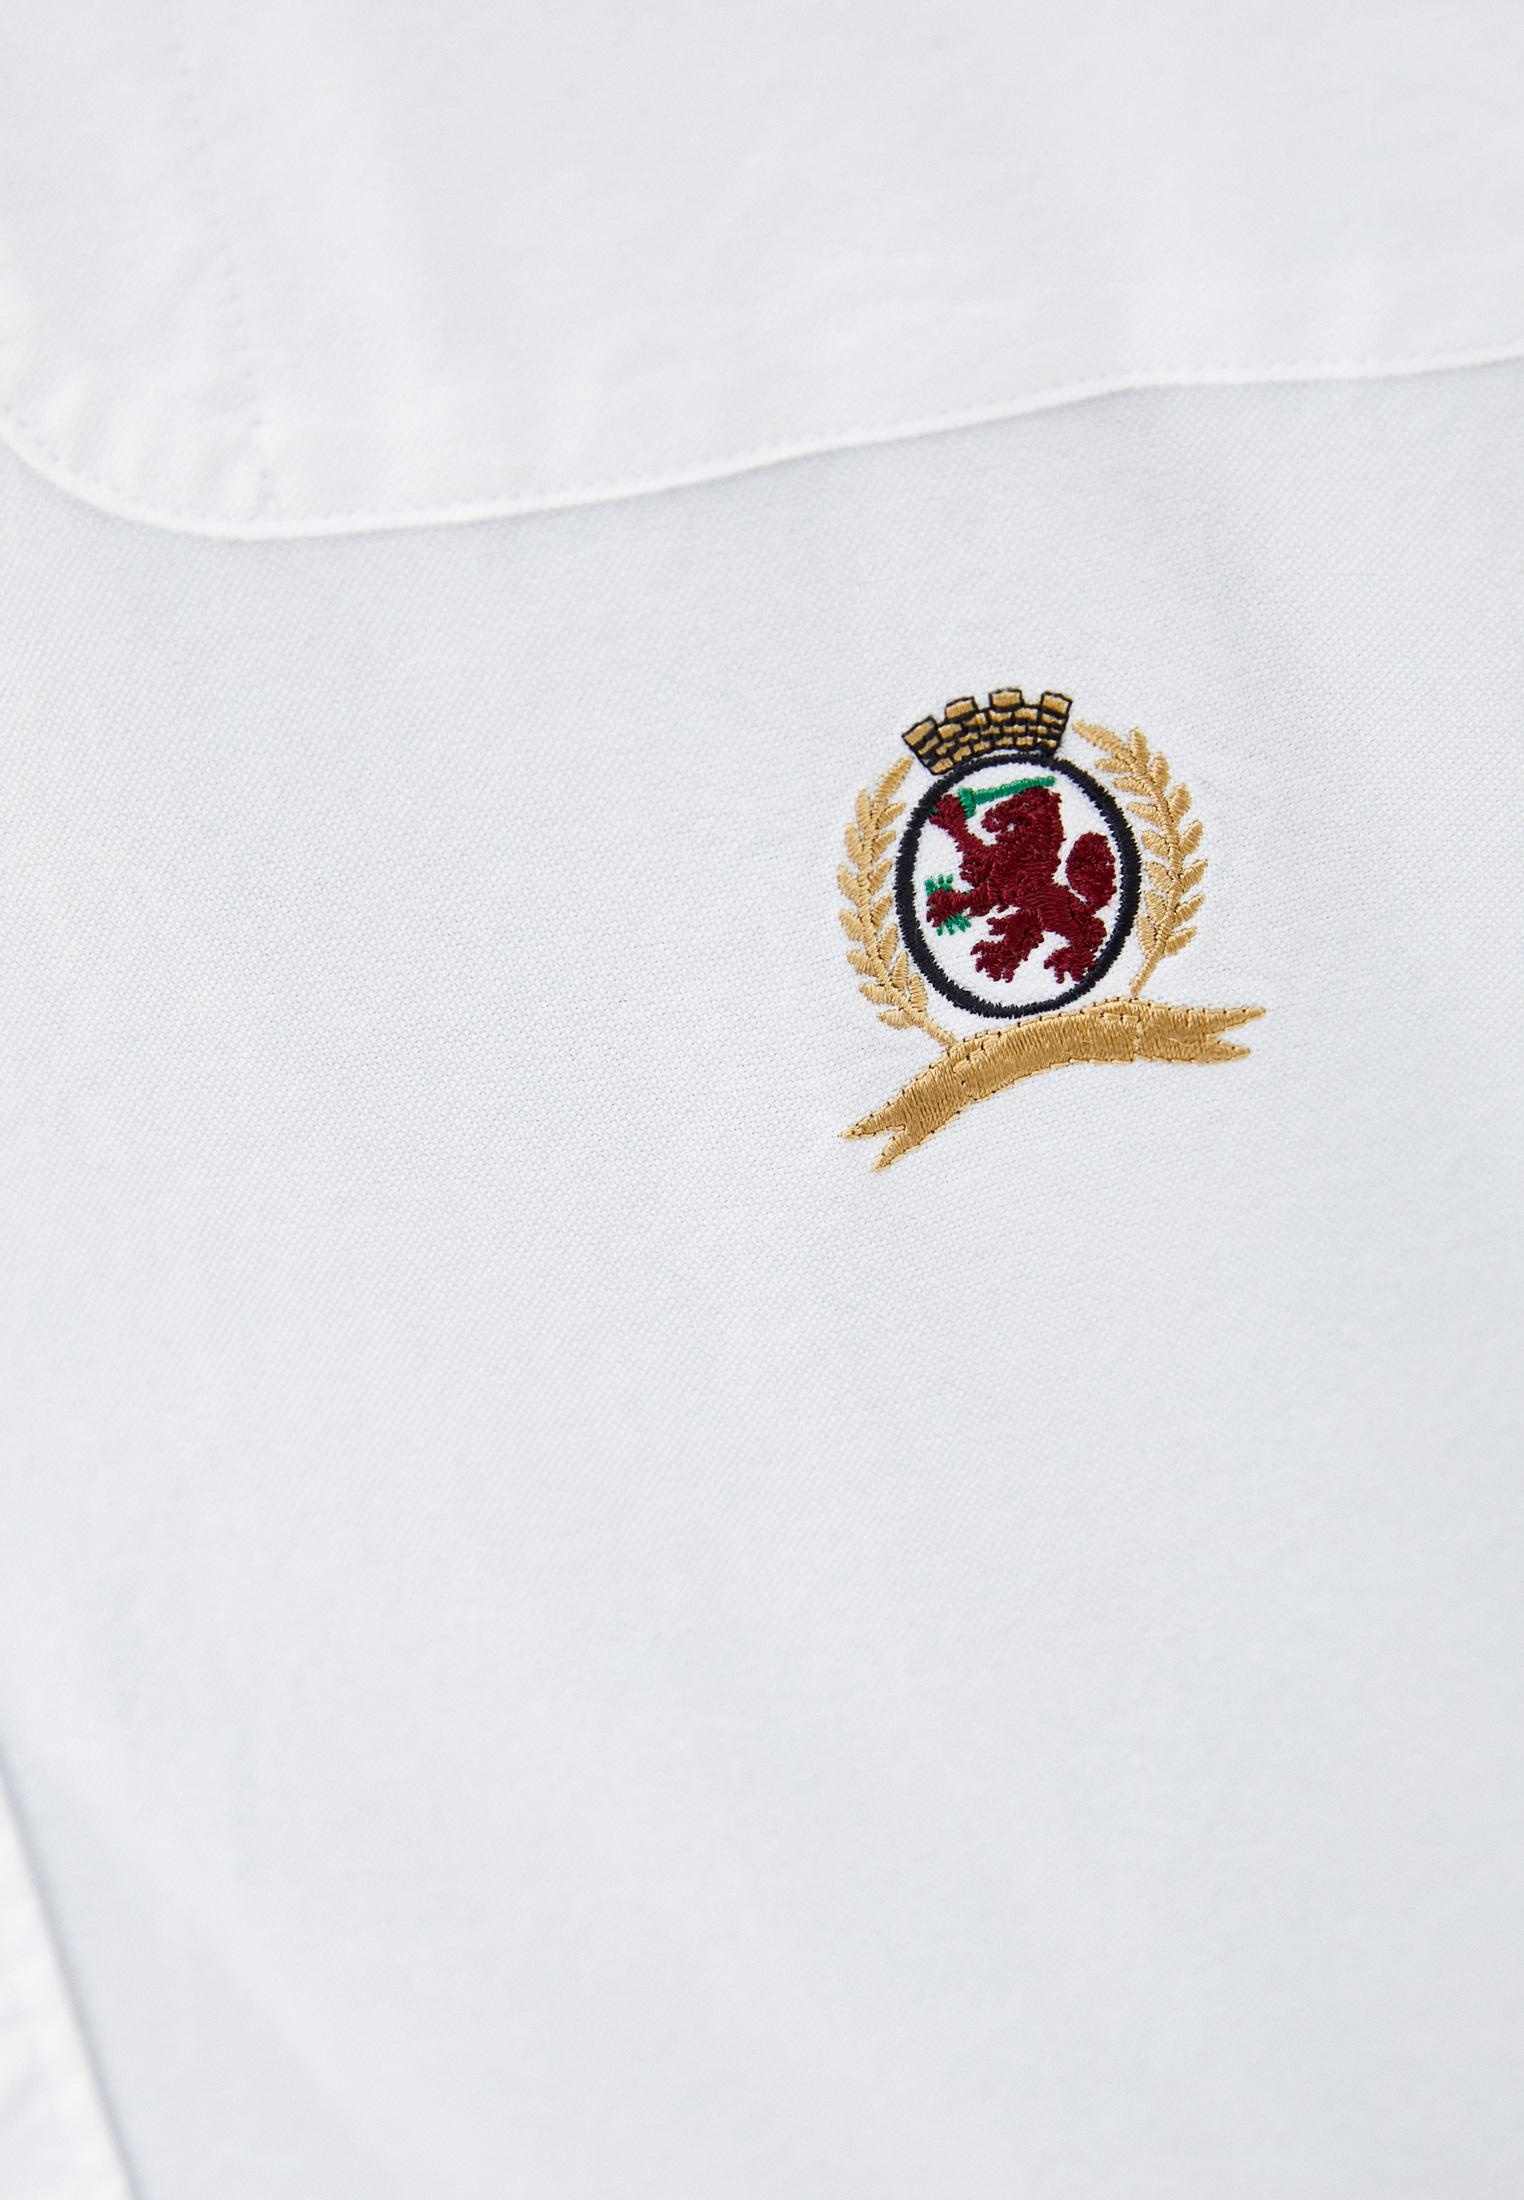 Рубашка Tommy Hilfiger (Томми Хилфигер) MW0MW18512: изображение 5